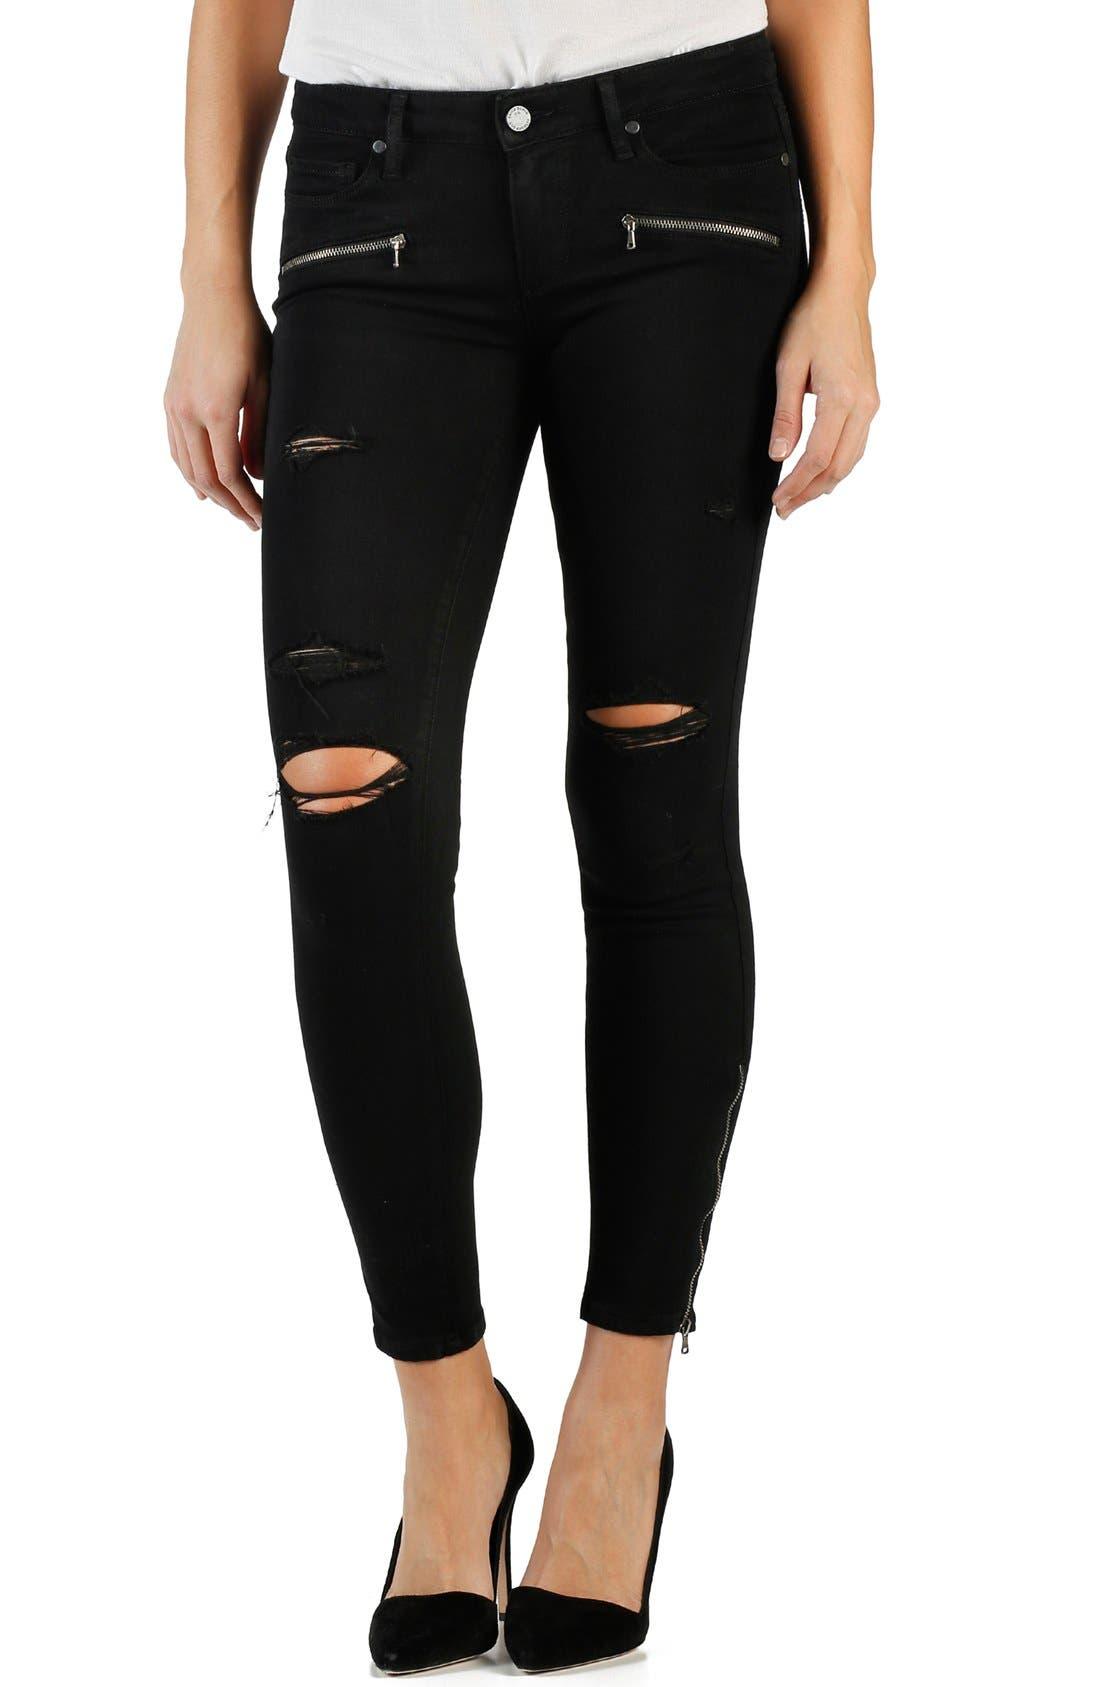 Alternate Image 1 Selected - Paige Denim 'Transcend - Jane' Crop Zip Skinny Jeans (Black Shadow)